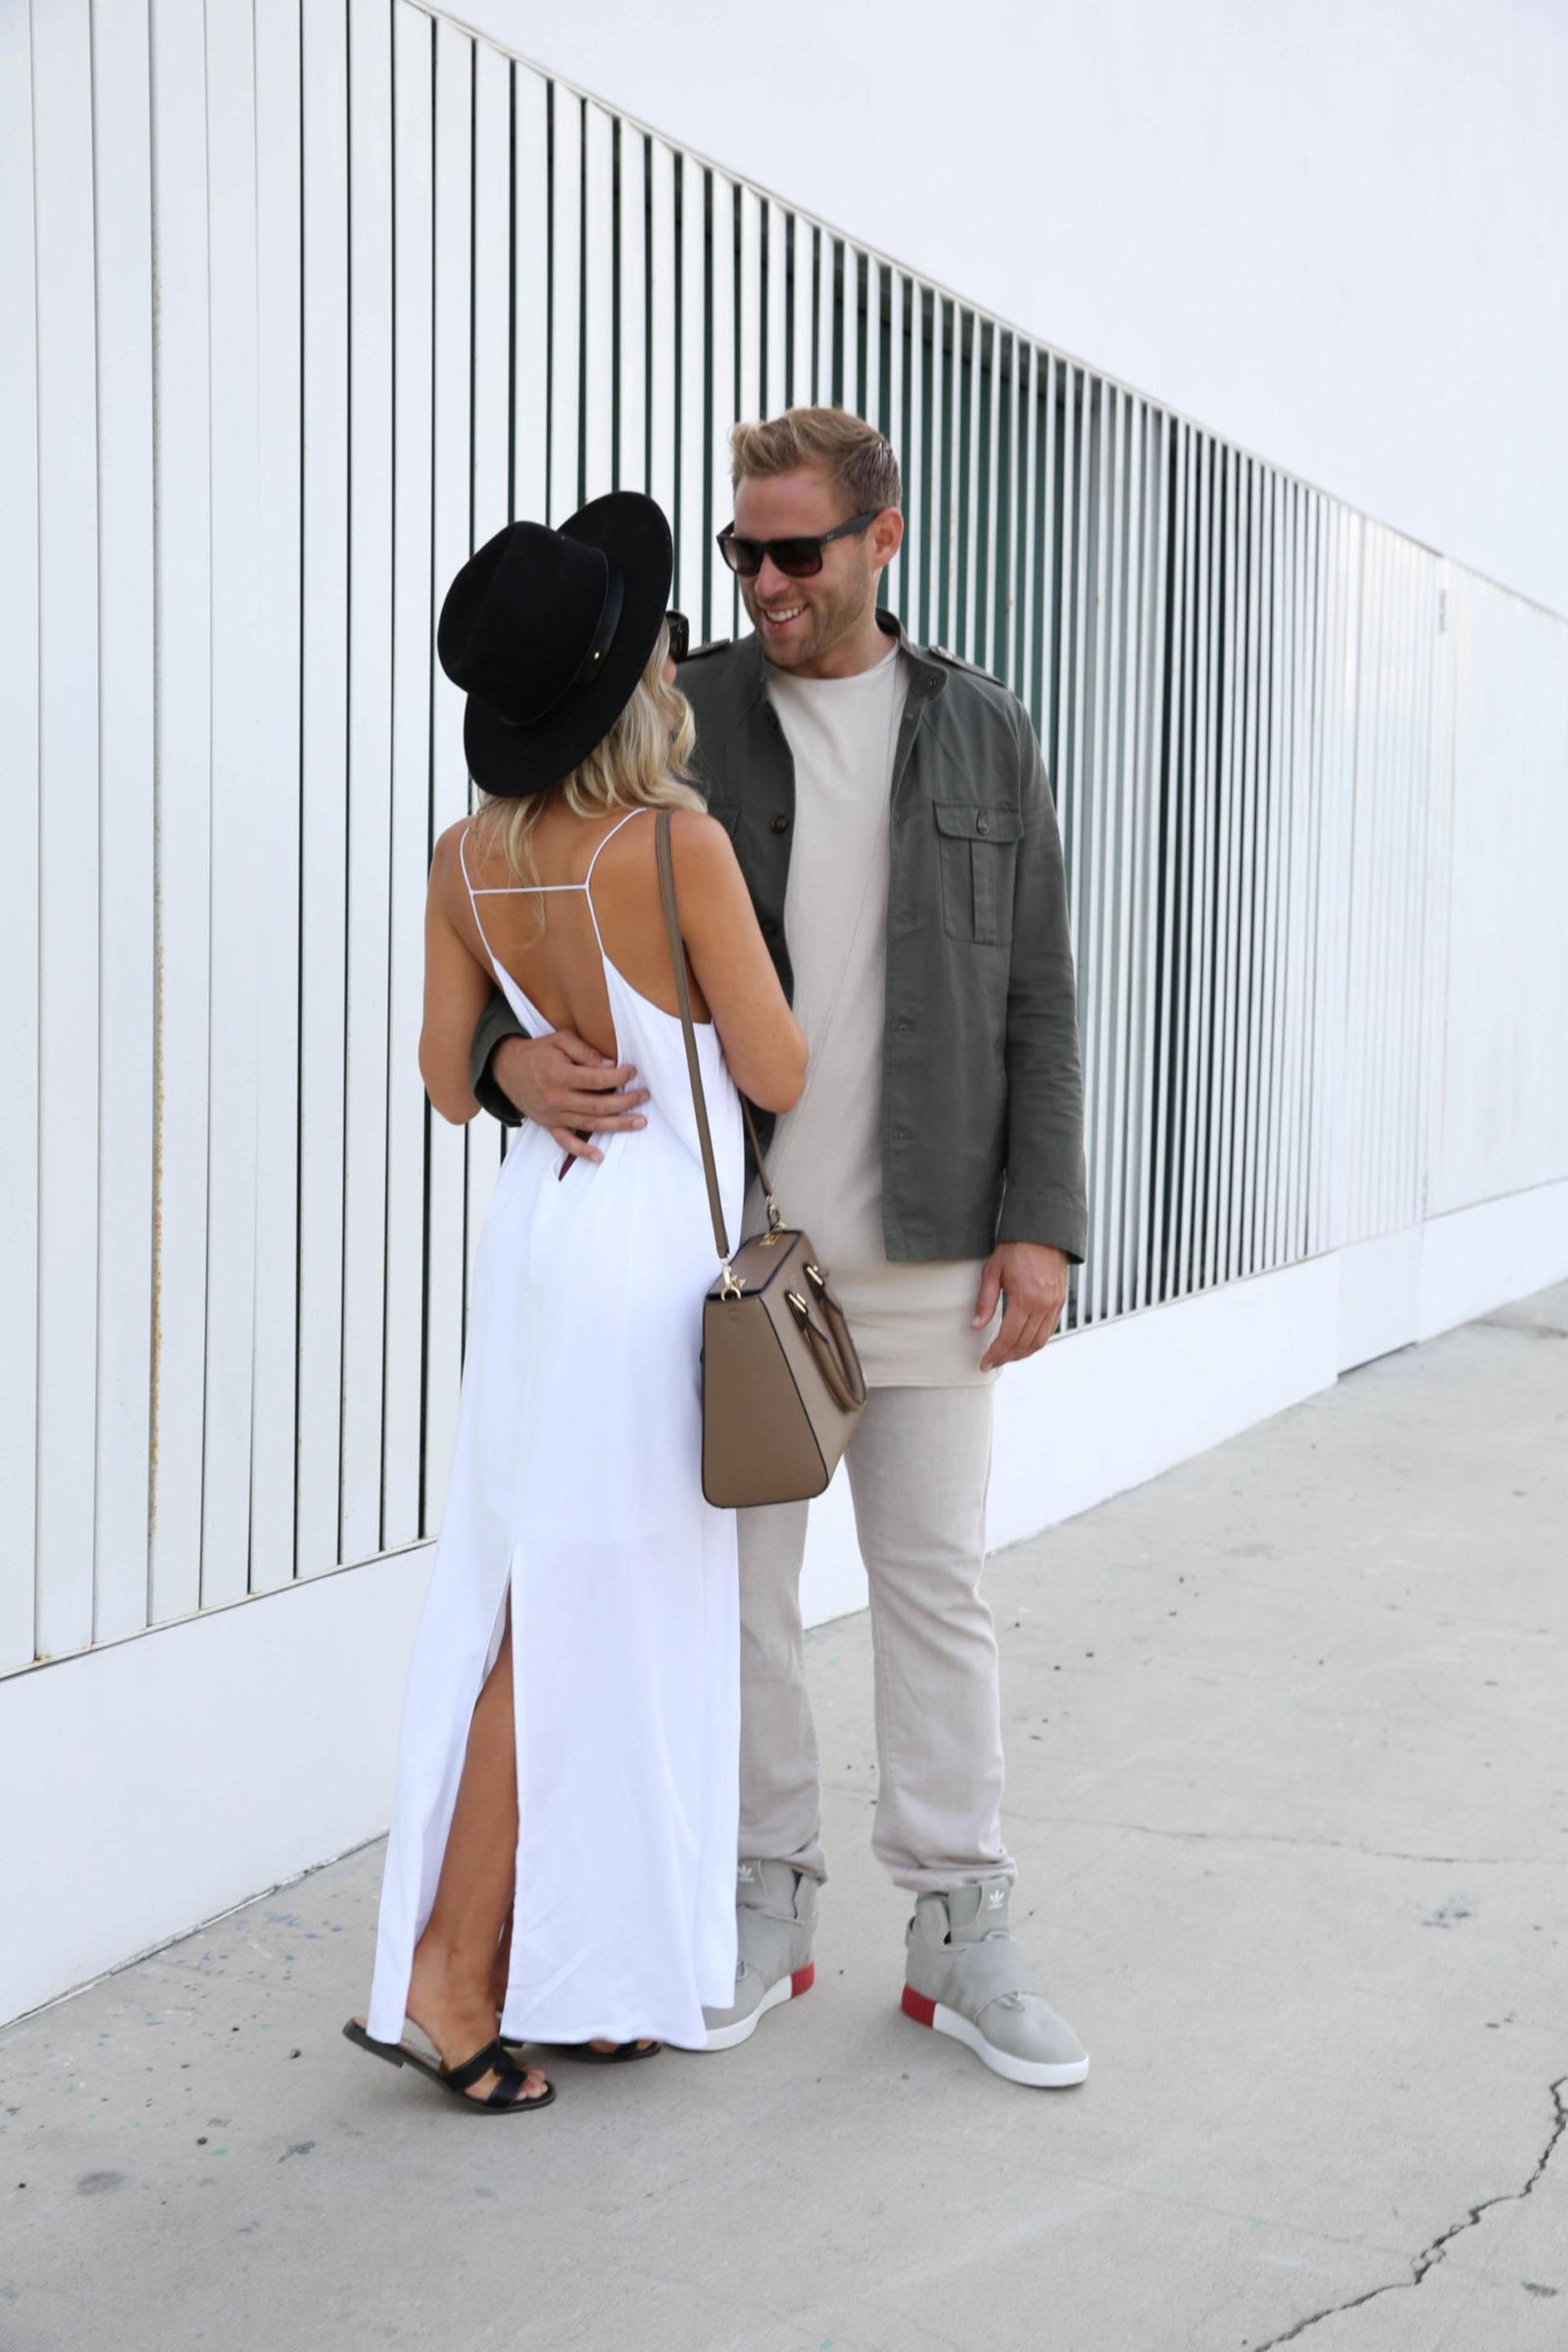 Him & Her: Fall in California